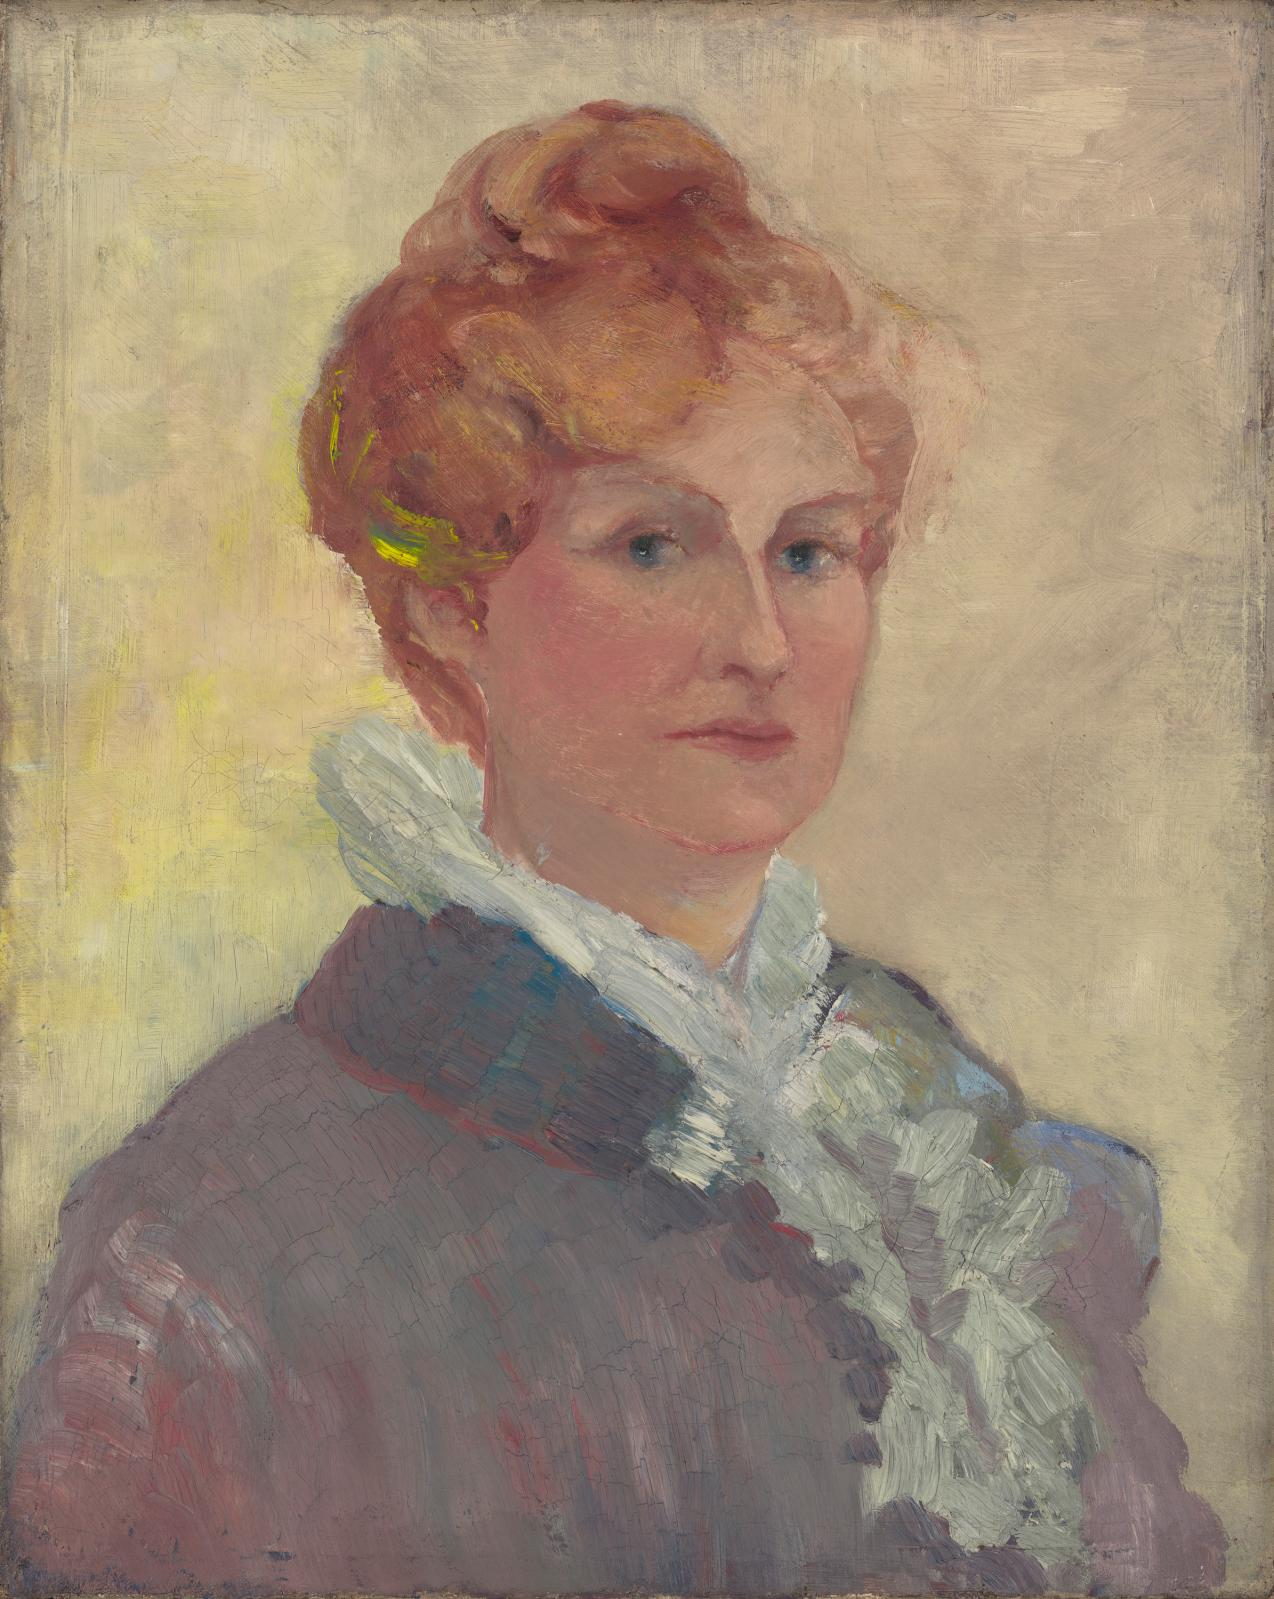 Katherine S. Dreier, Self-Portrait, 1911. Gift of Katherine S. Dreier.Photo courtesy of Yale University Art Gallery